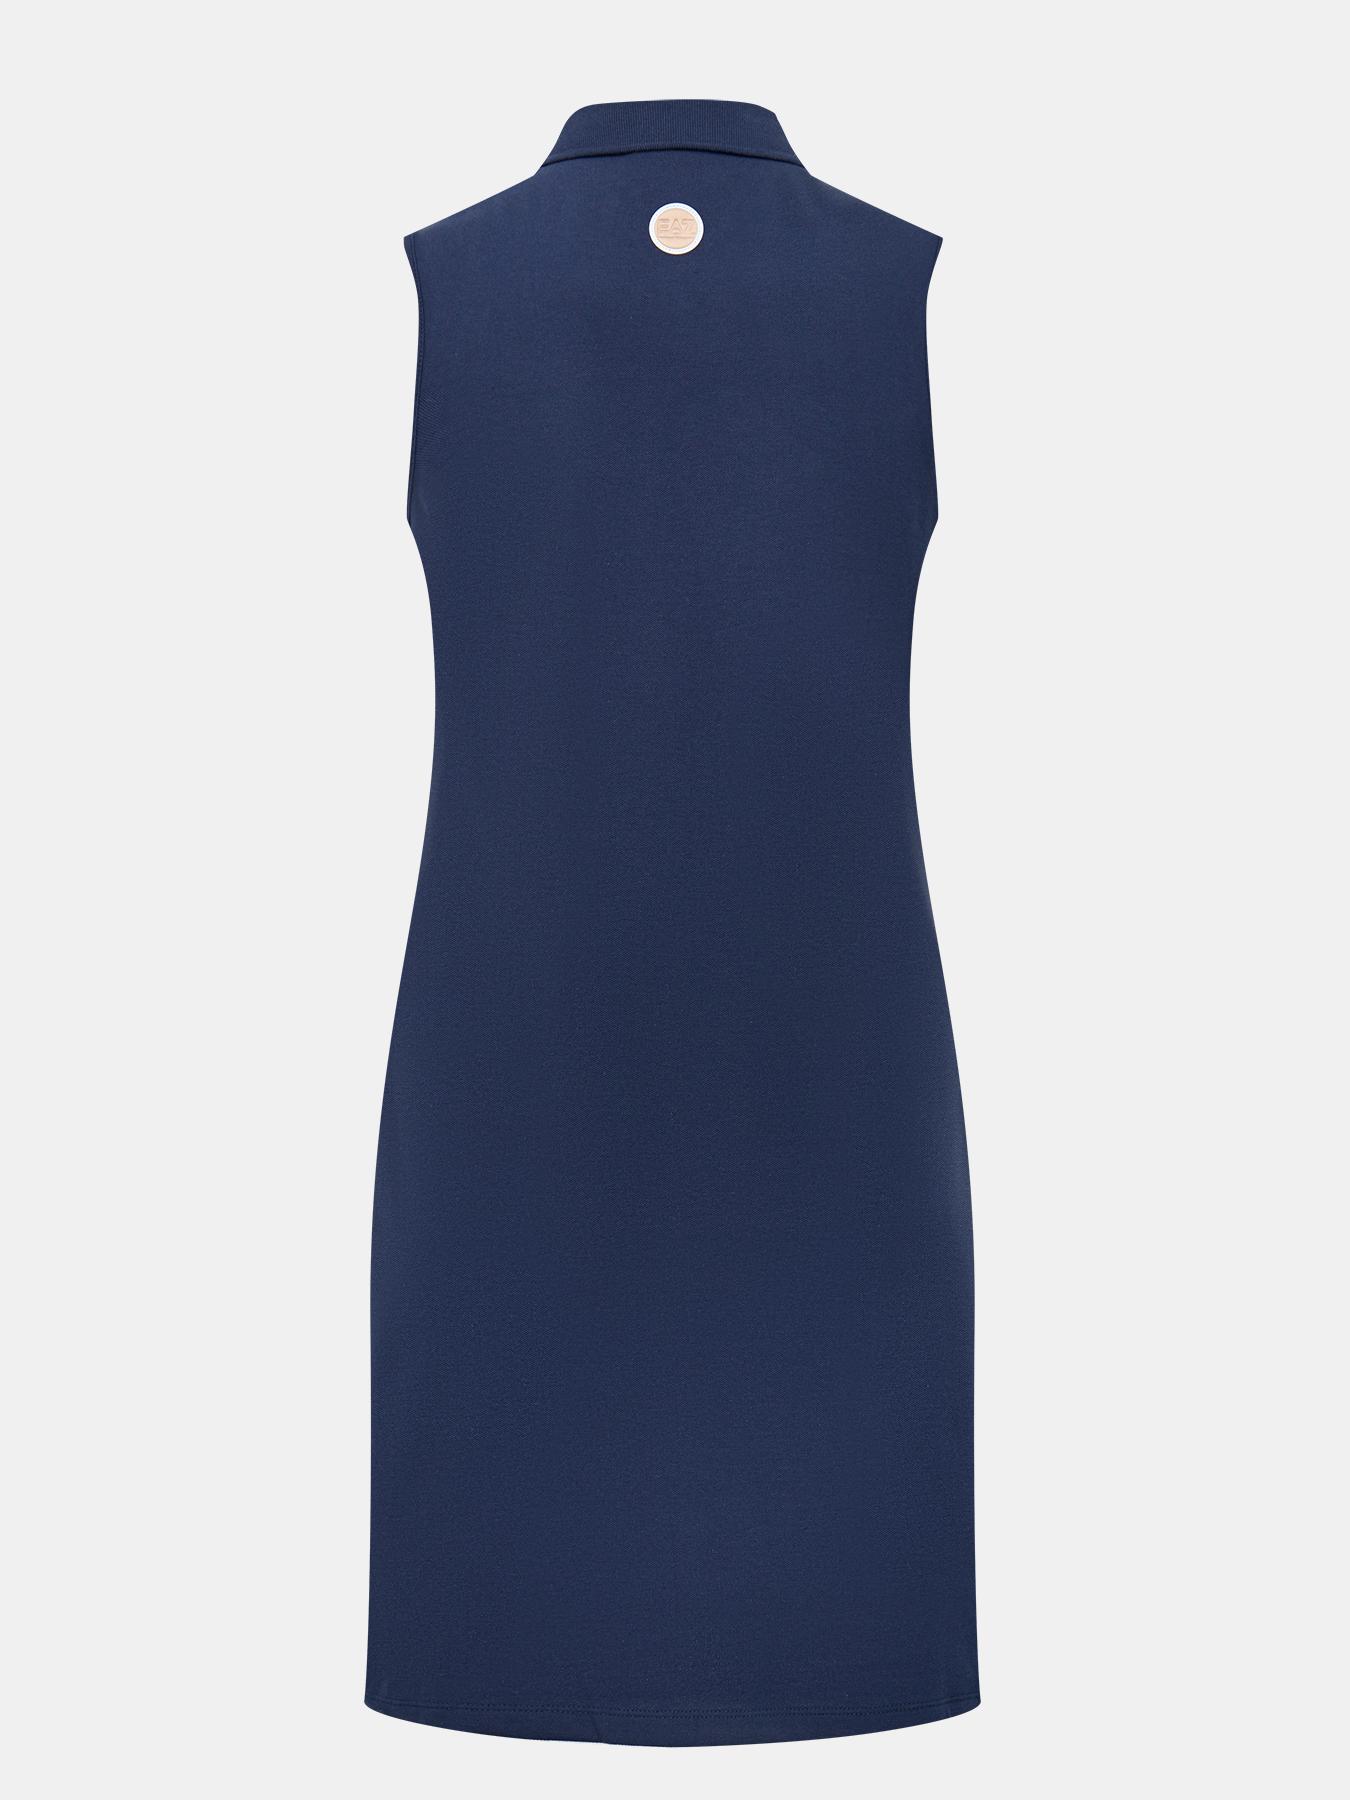 Платье EA7 Emporio Armani Платье легкое асимметричное платье emporio armani